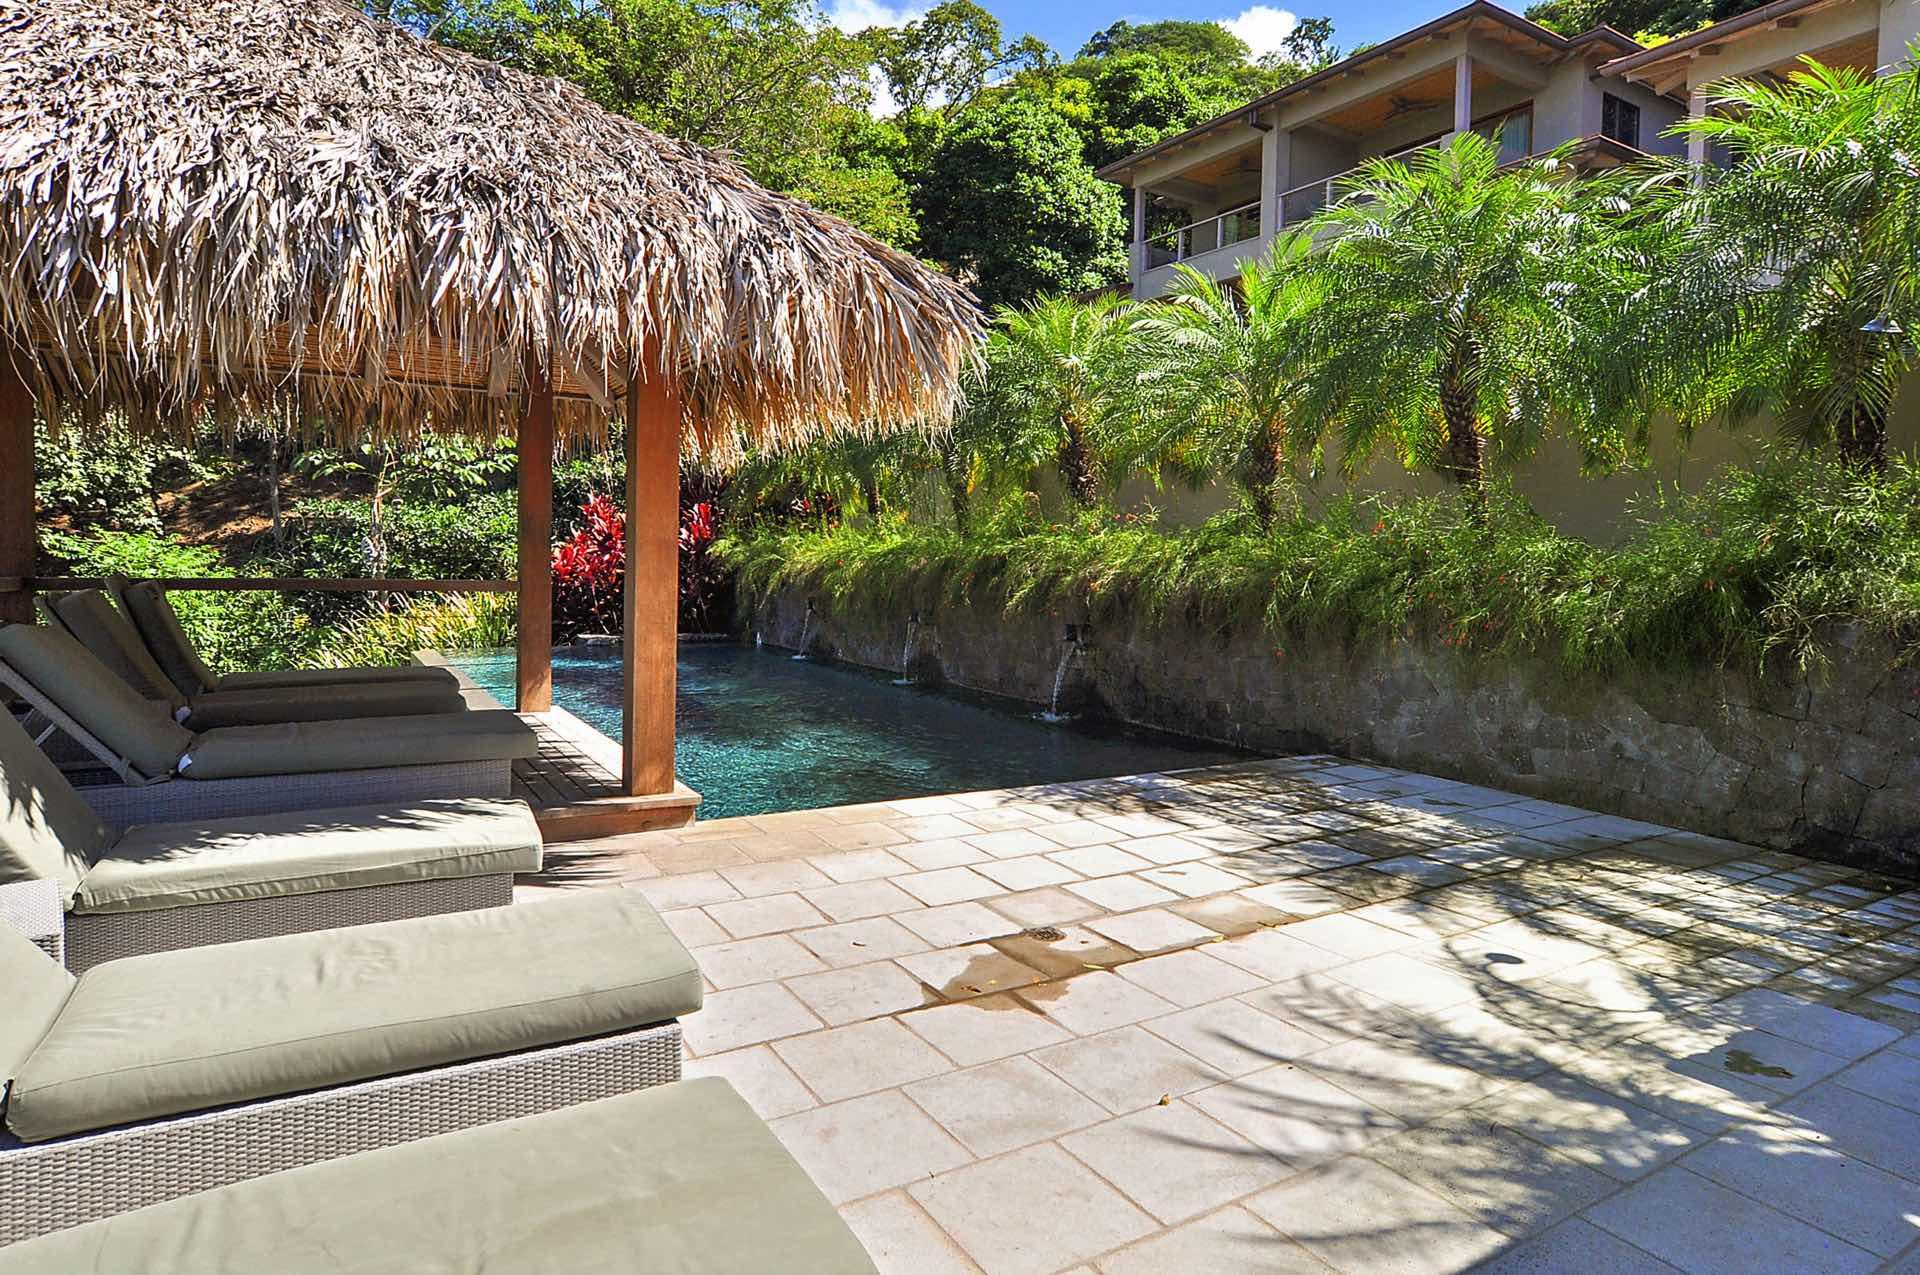 Pool area and sun terrace at Las Mareas